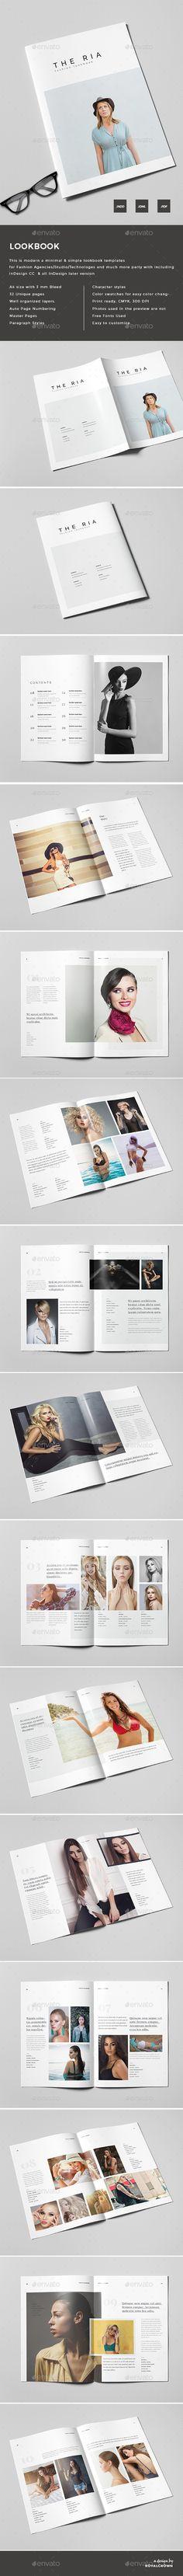 Lookbook - Magazines Print Templates Download here : https://graphicriver.net/item/lookbook/18341492?s_rank=87&ref=Al-fatih